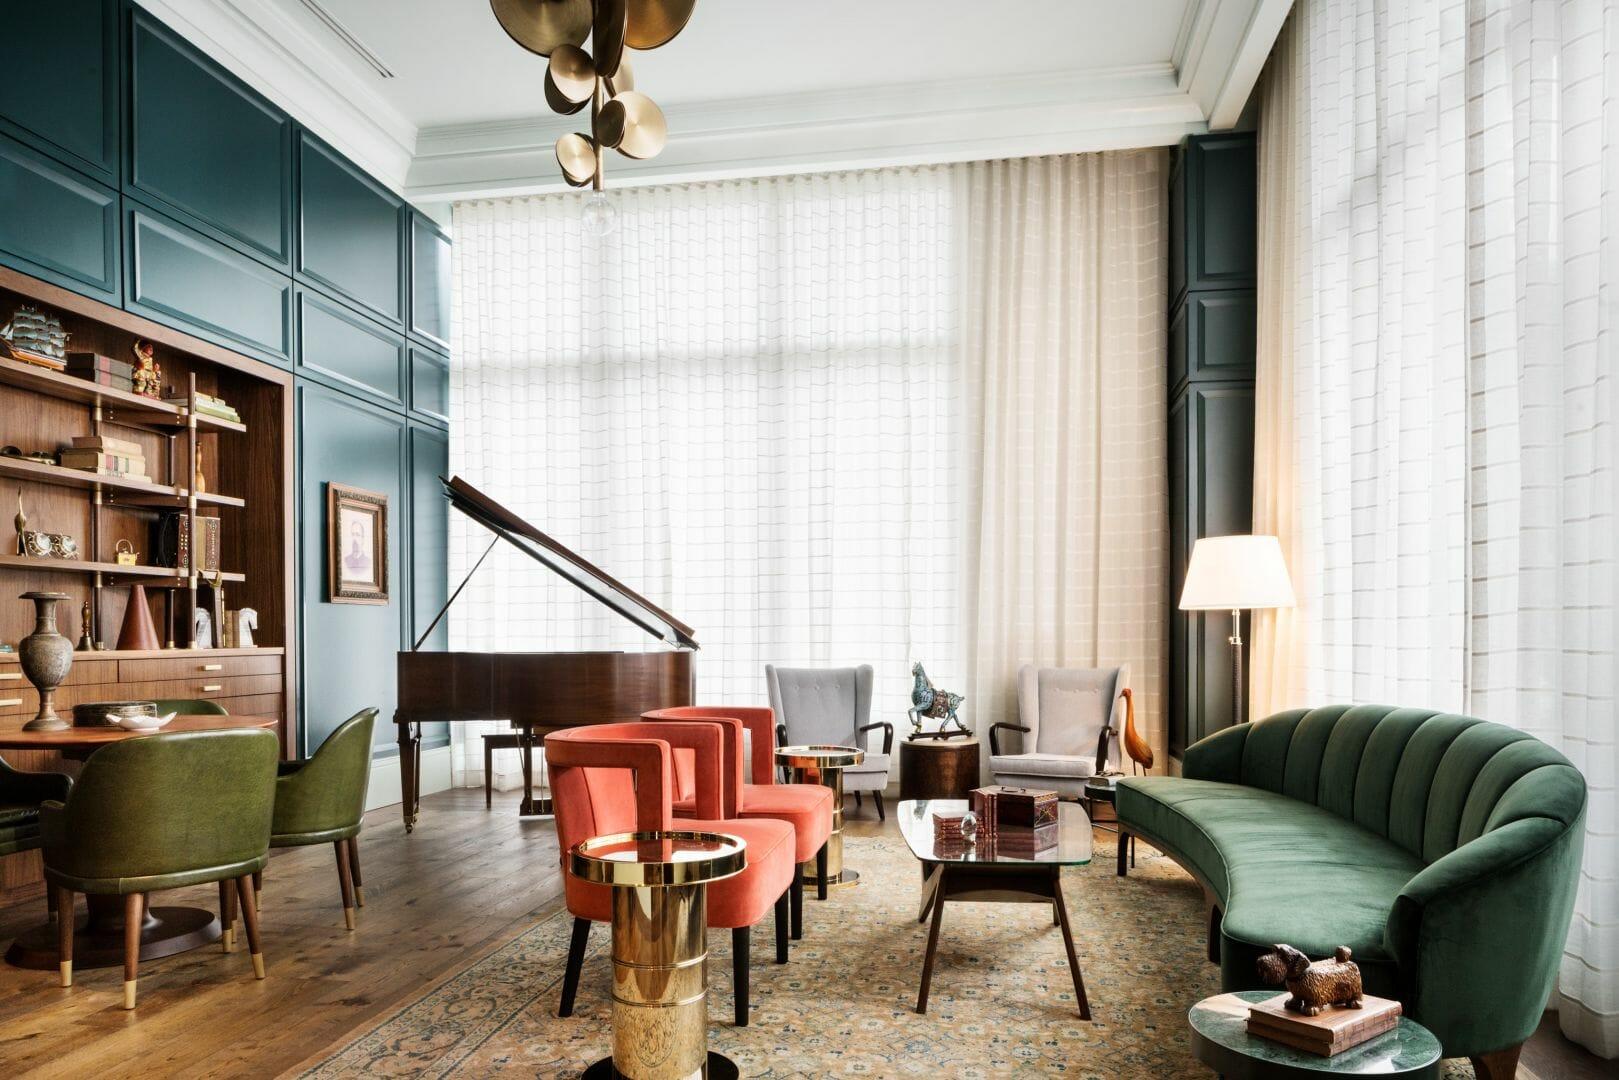 Best savannah interior designers - Perry Lane Hotel